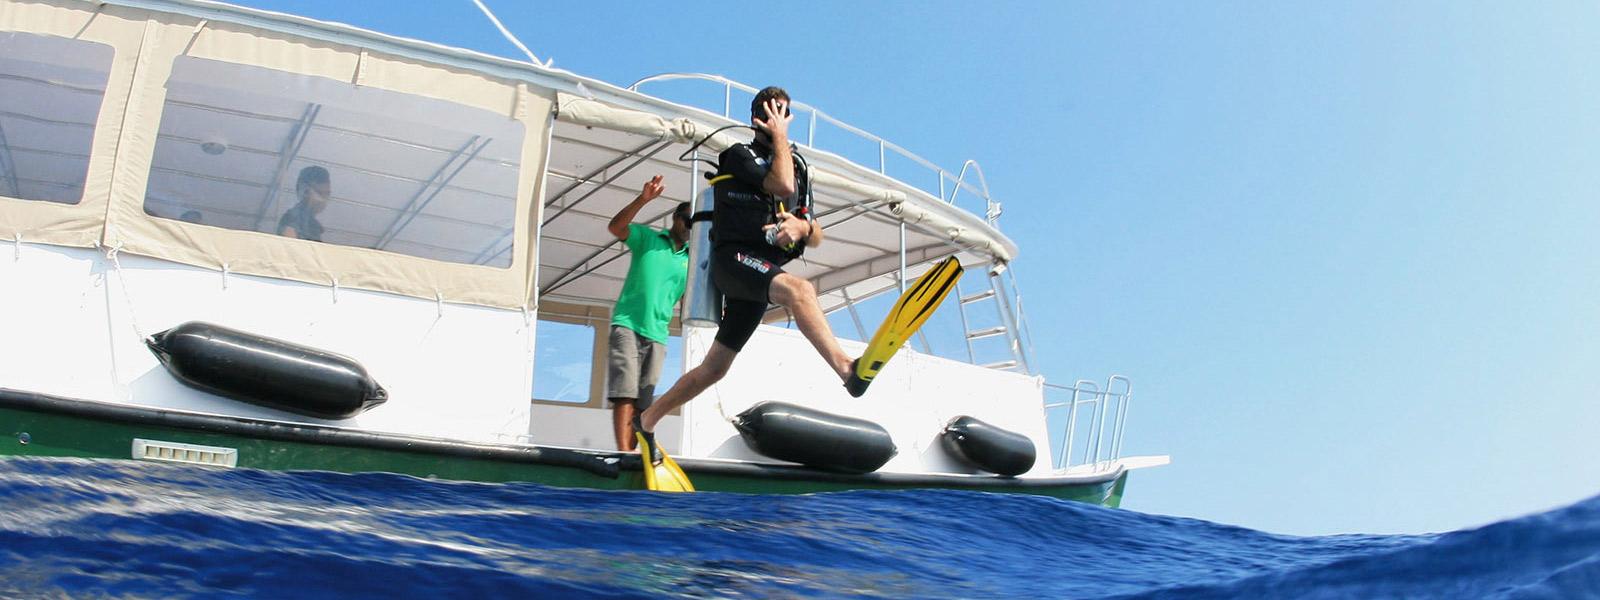 Maldives Scuba Diving Boat